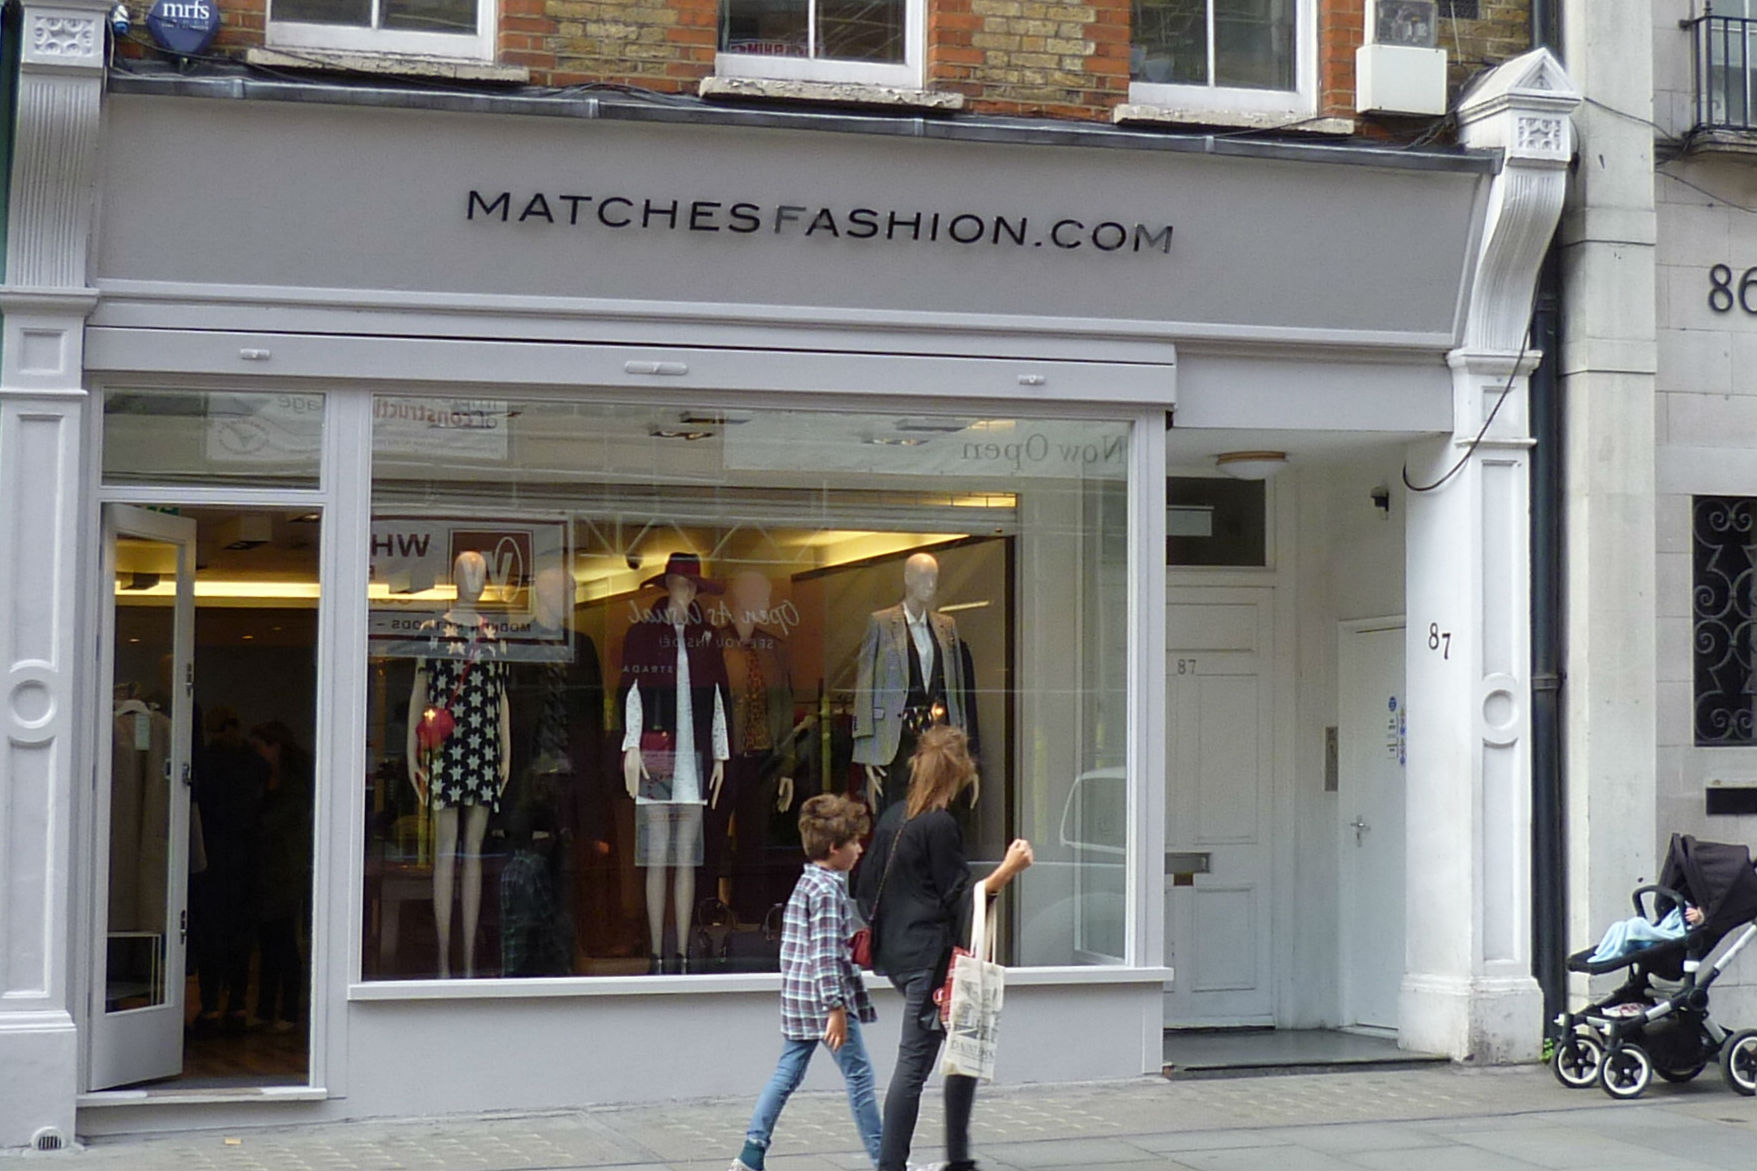 MatchesFashion_fashion_shopfront_Wikimedia-Commons-4.jpg